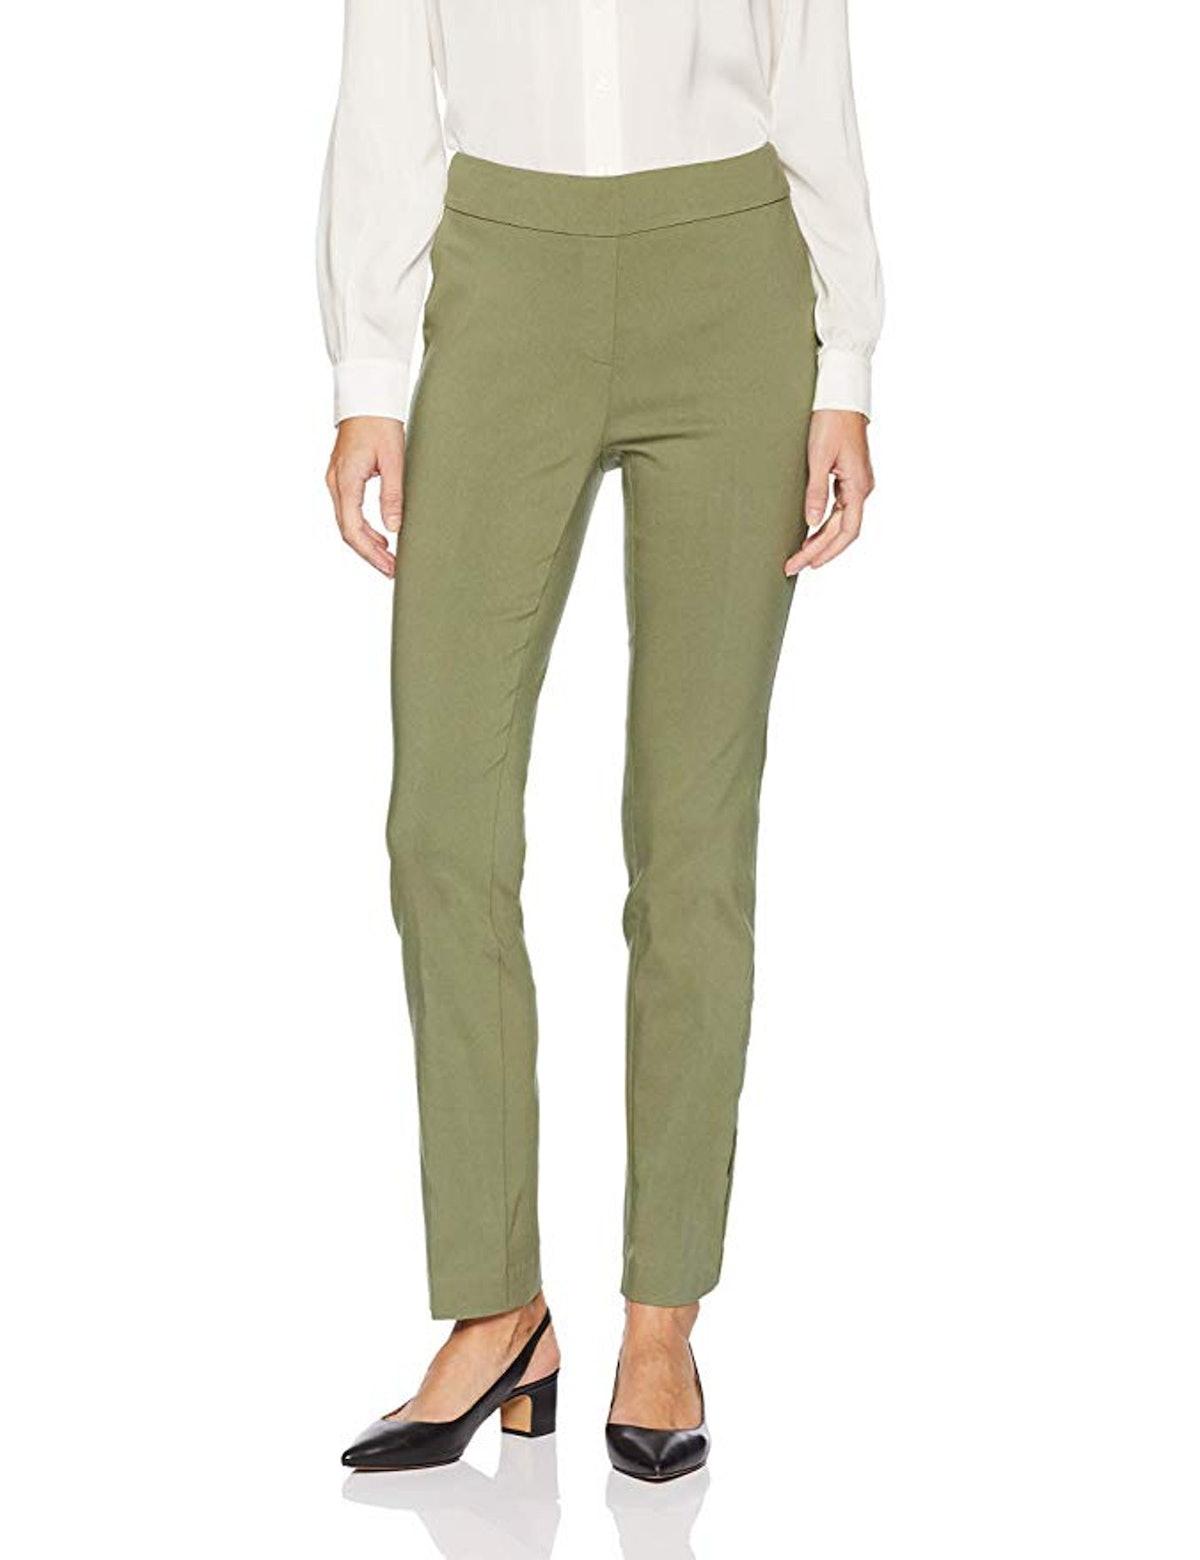 Lark & Ro Women's Slim Leg Stretch Pant: Comfort Fit